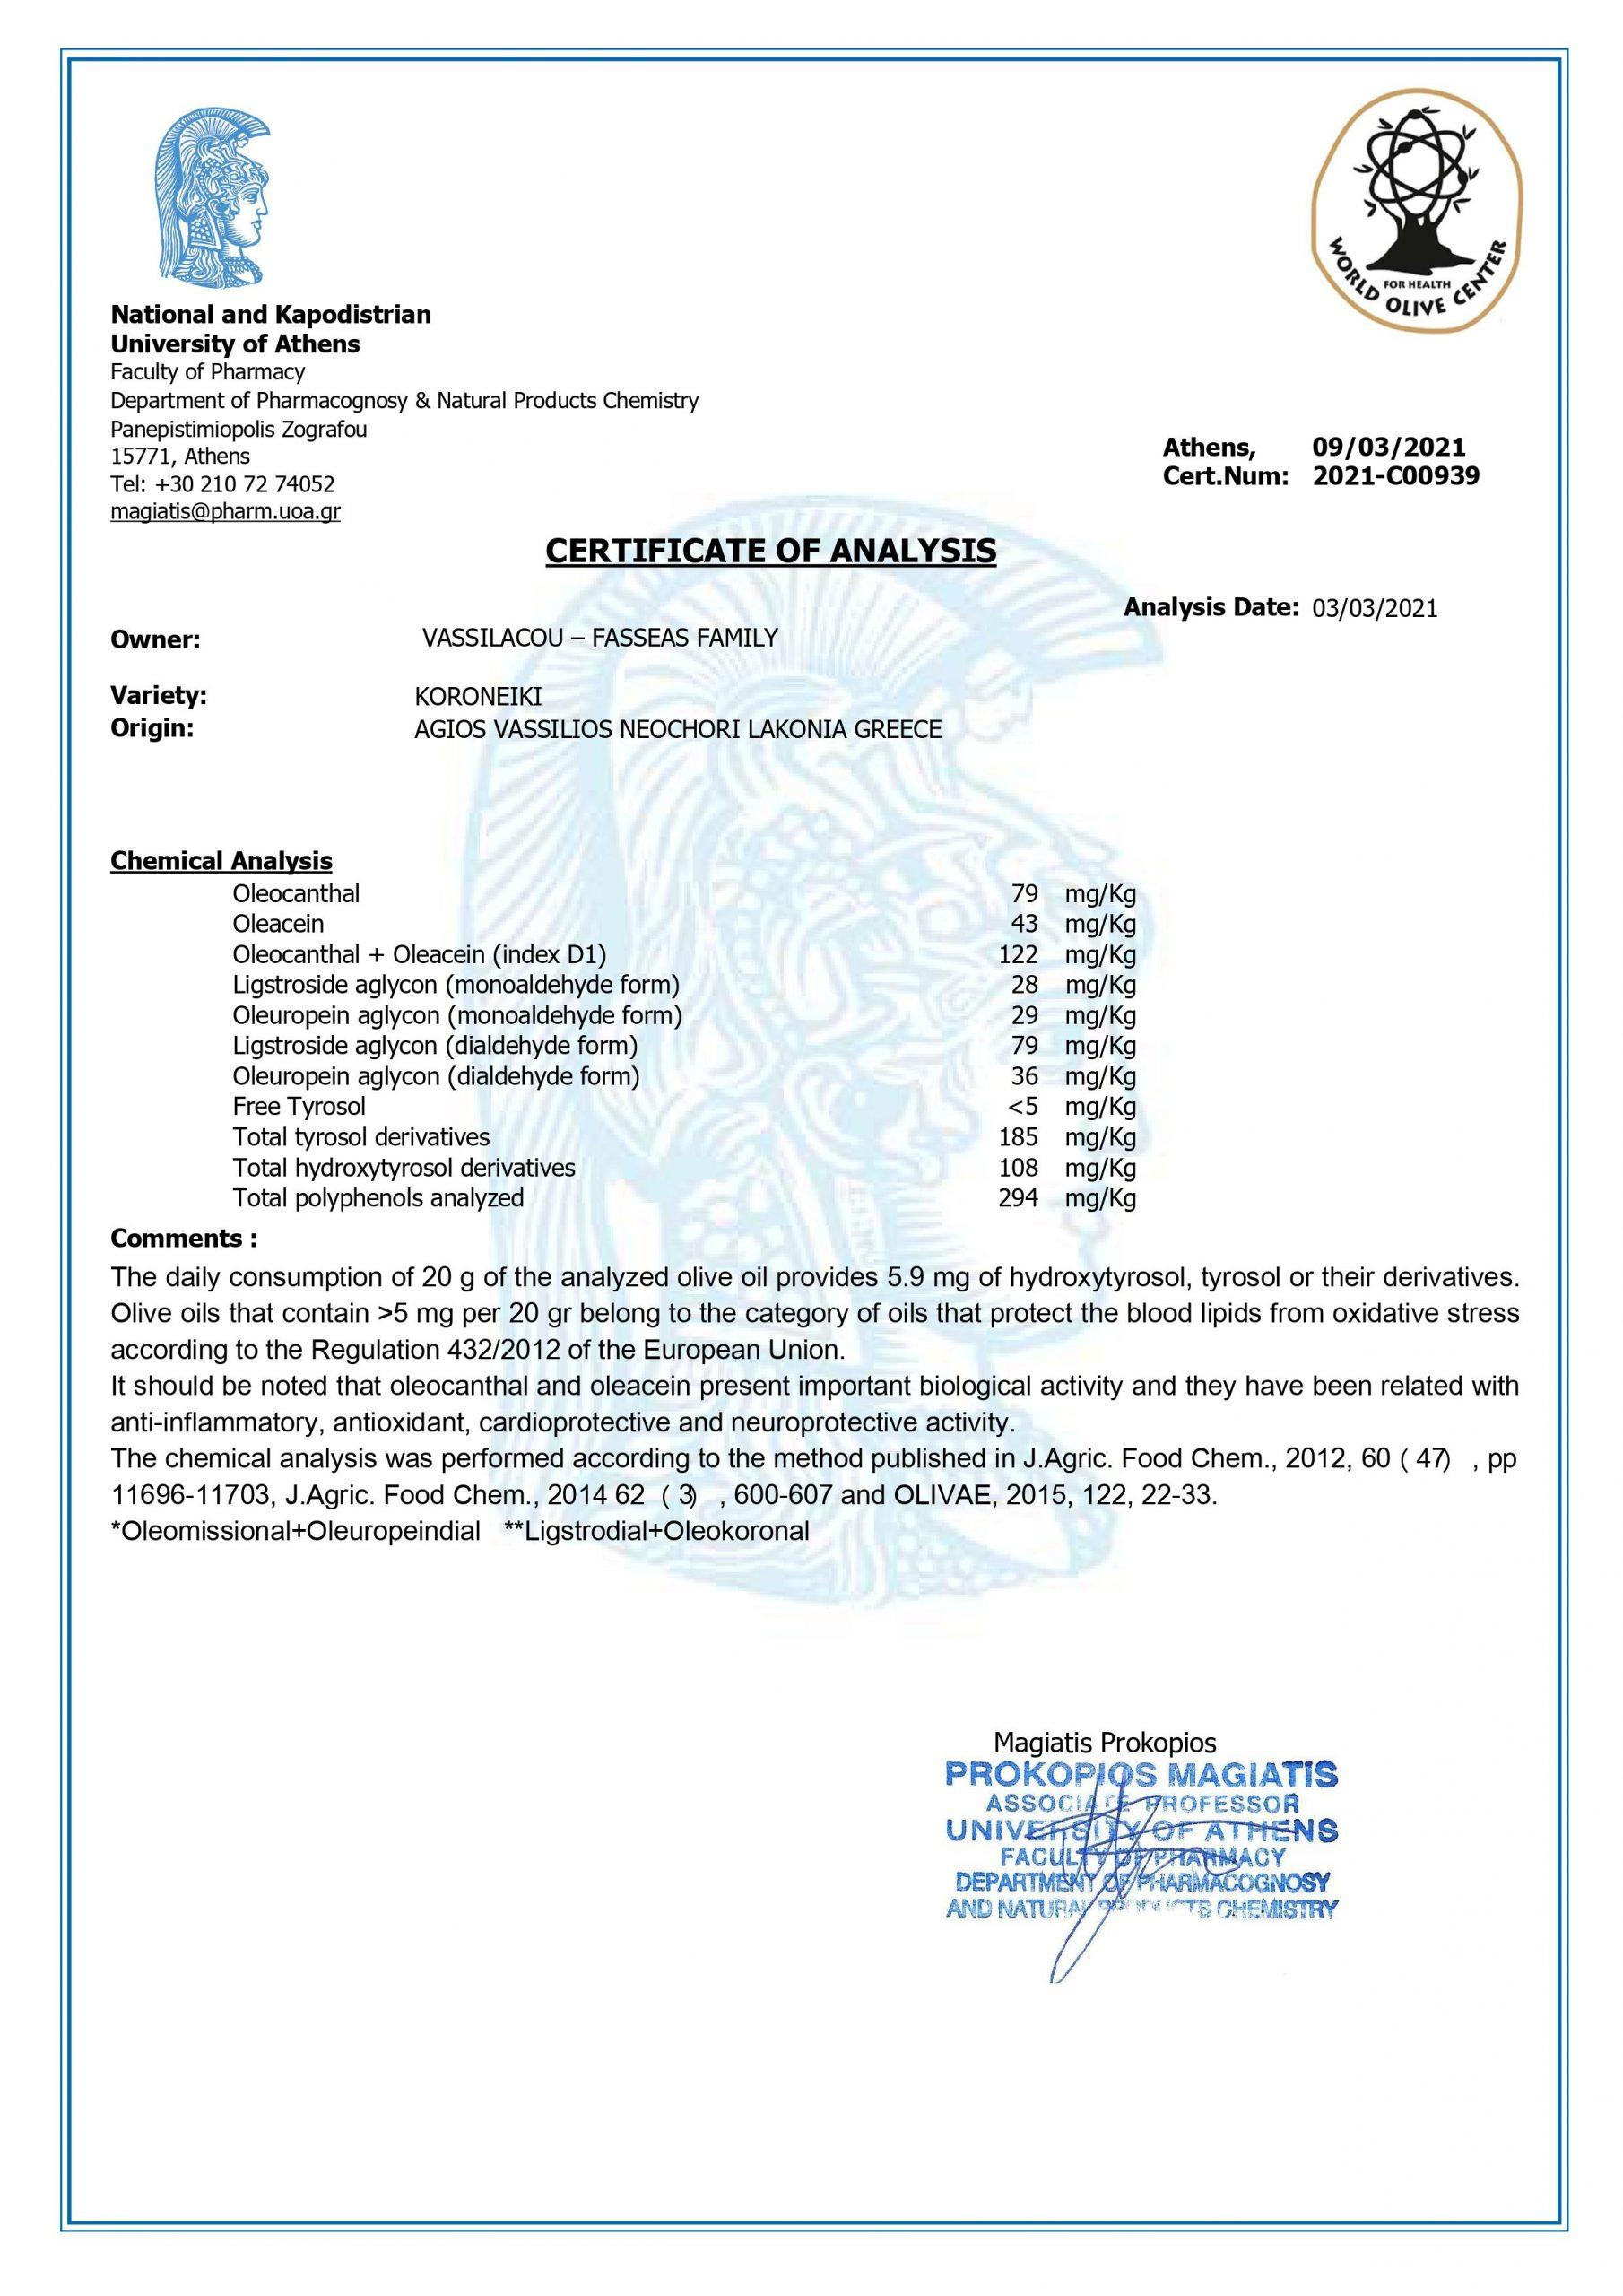 EHTL - 2021 Certificat d'analyses huile d'olive